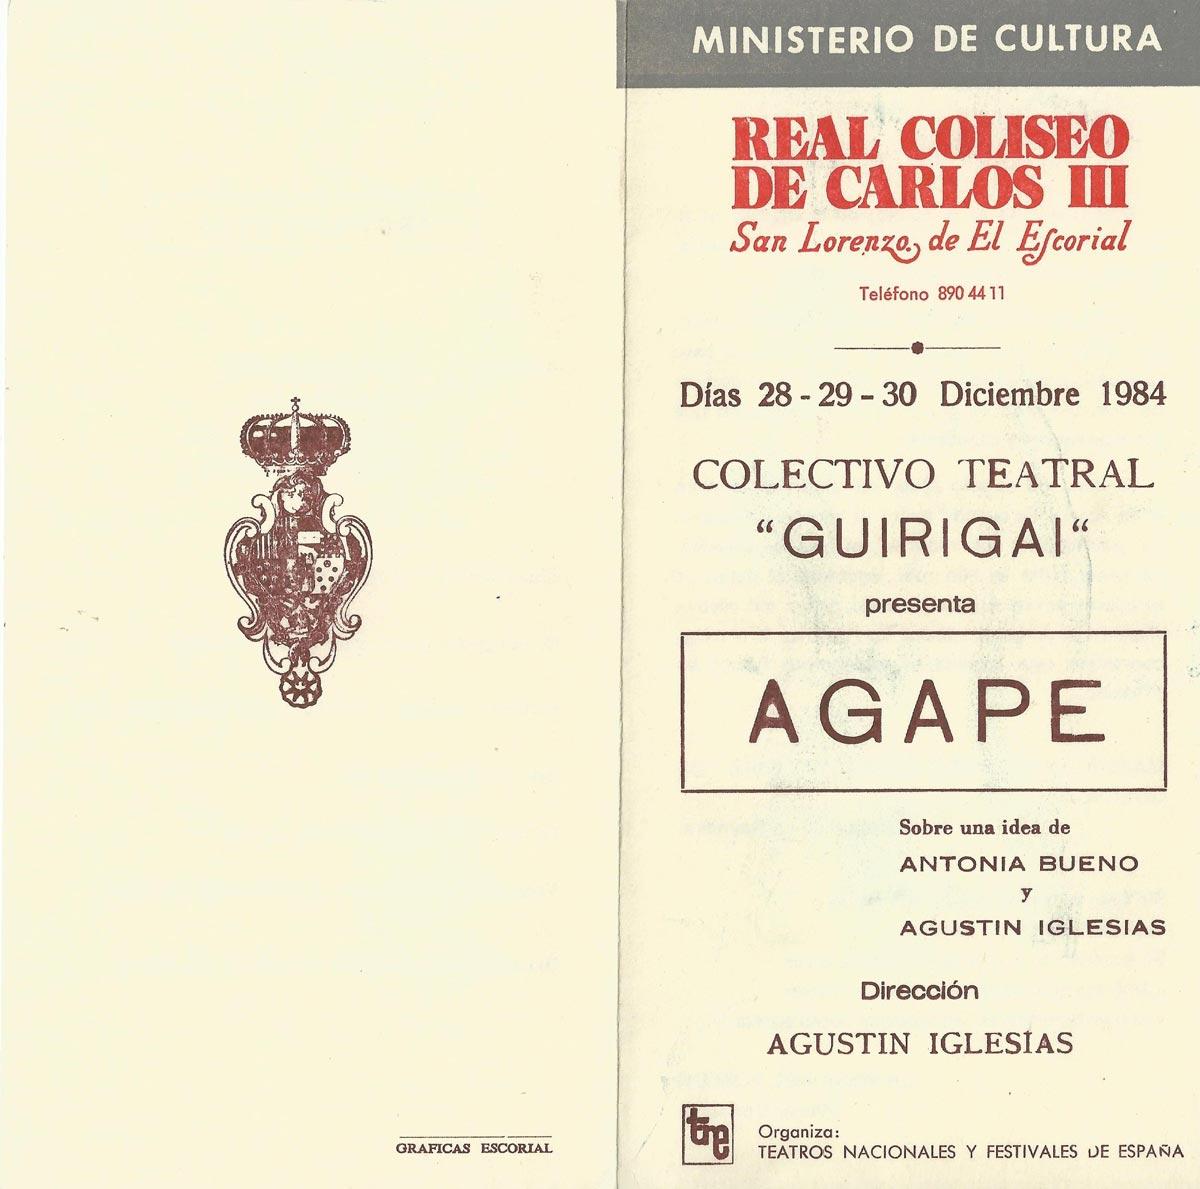 1982-Agape-Guirigai-cartel-05